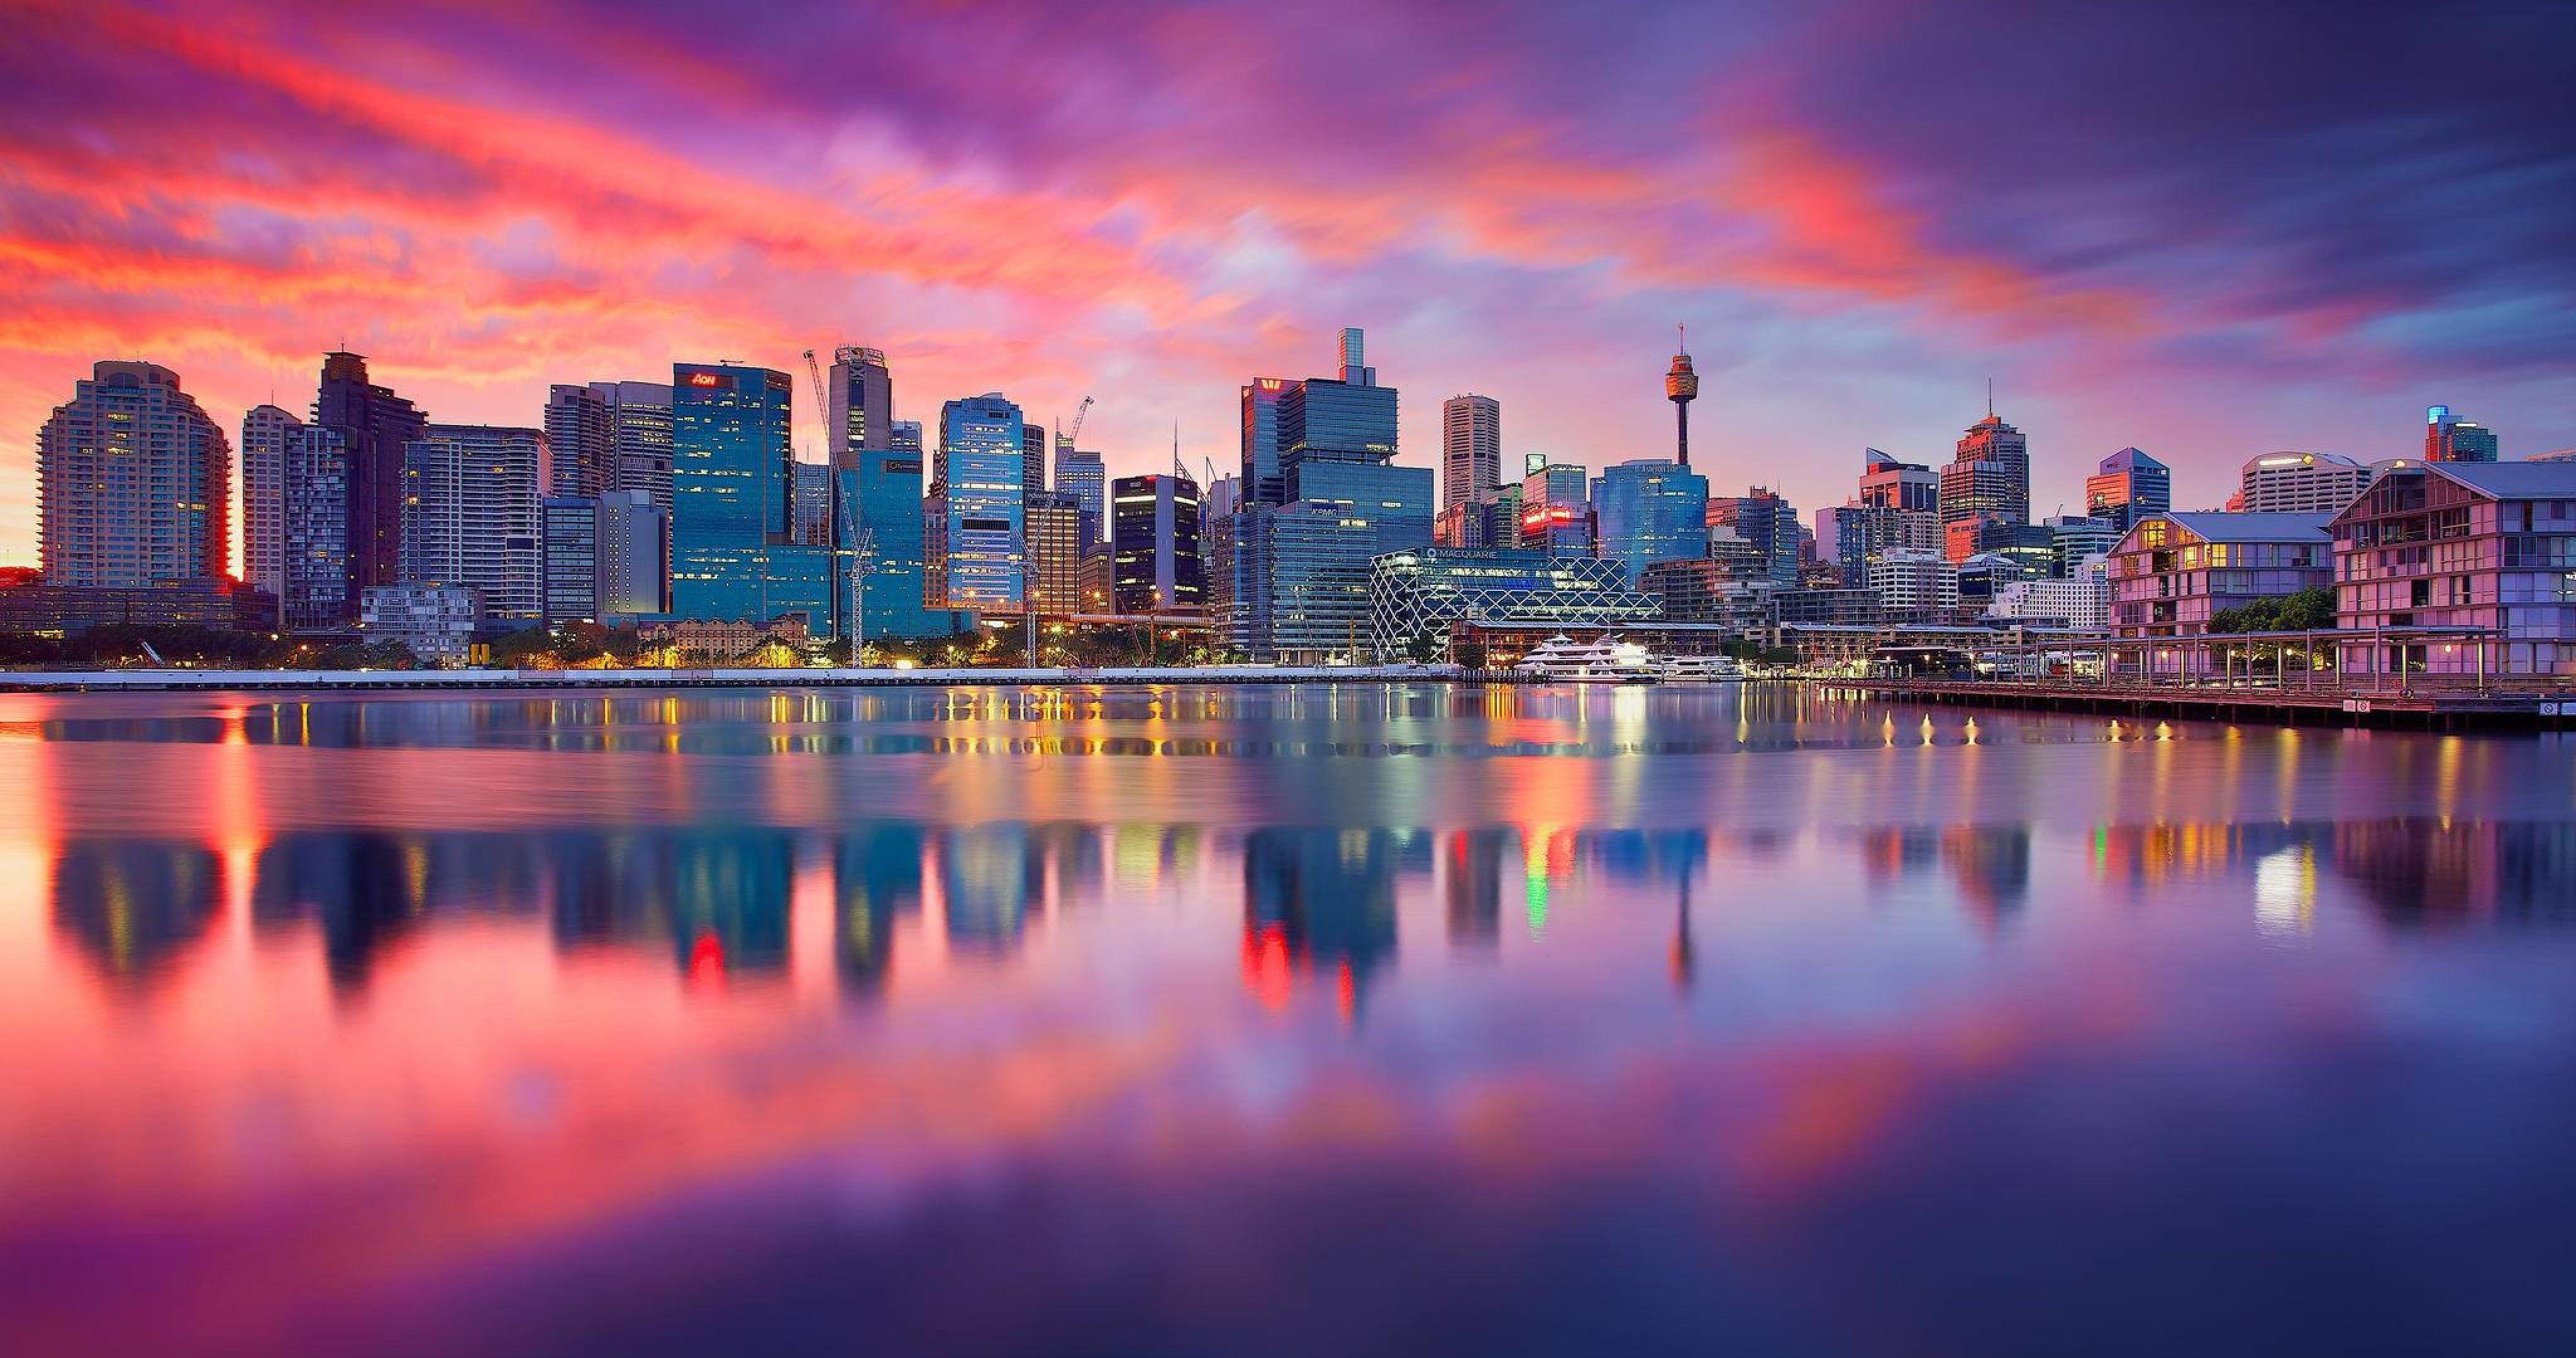 City Sydney Dawn 4k Ultra Hd Wallpaper